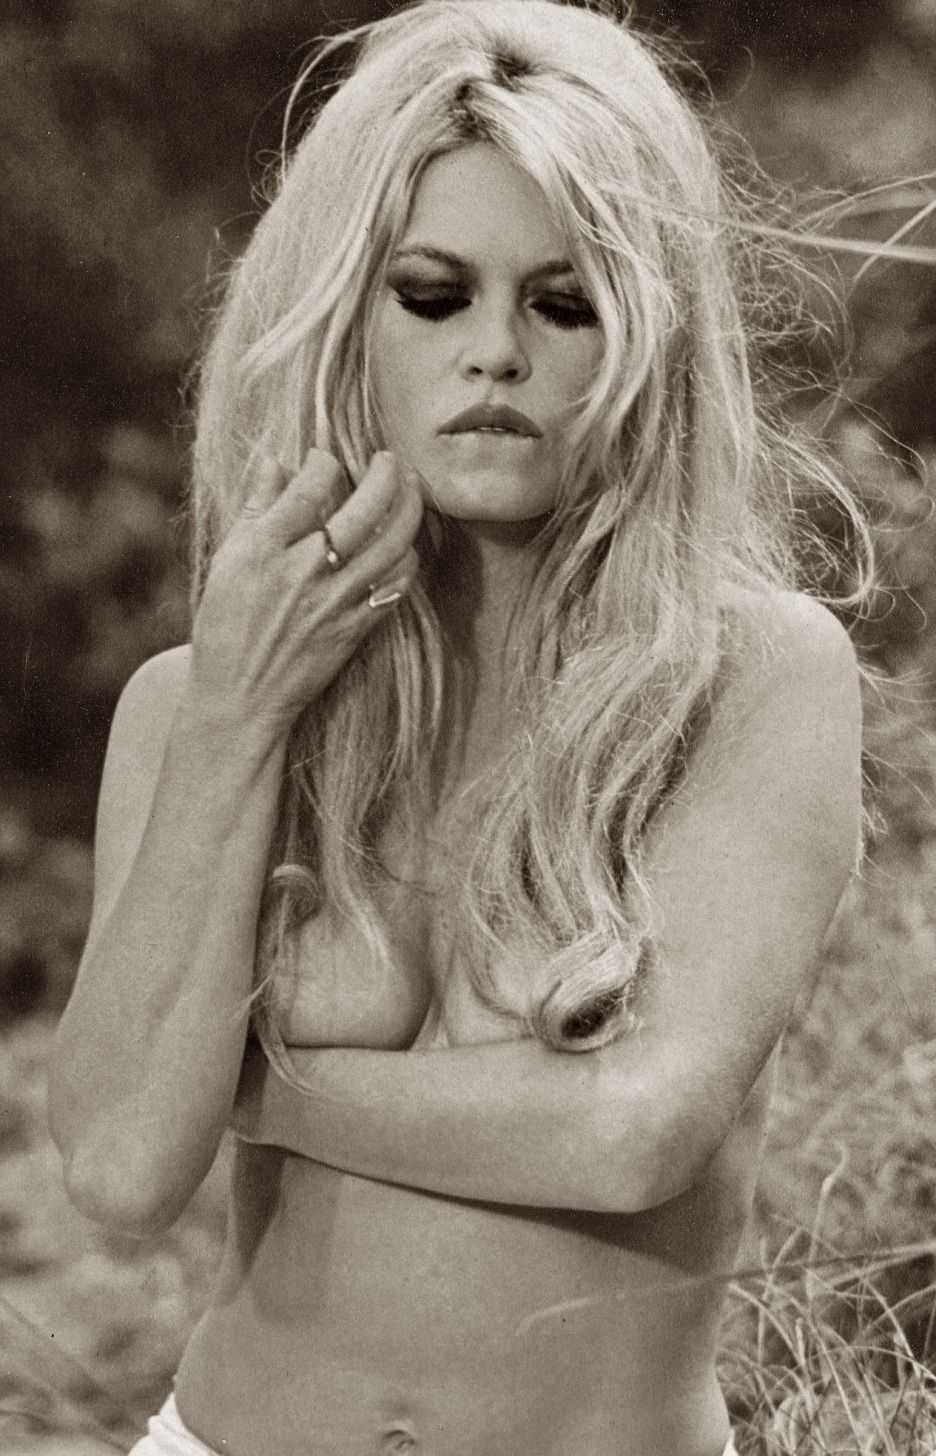 brigitte bardot | brigitte_bardot | pinterest | bardot, celebrity